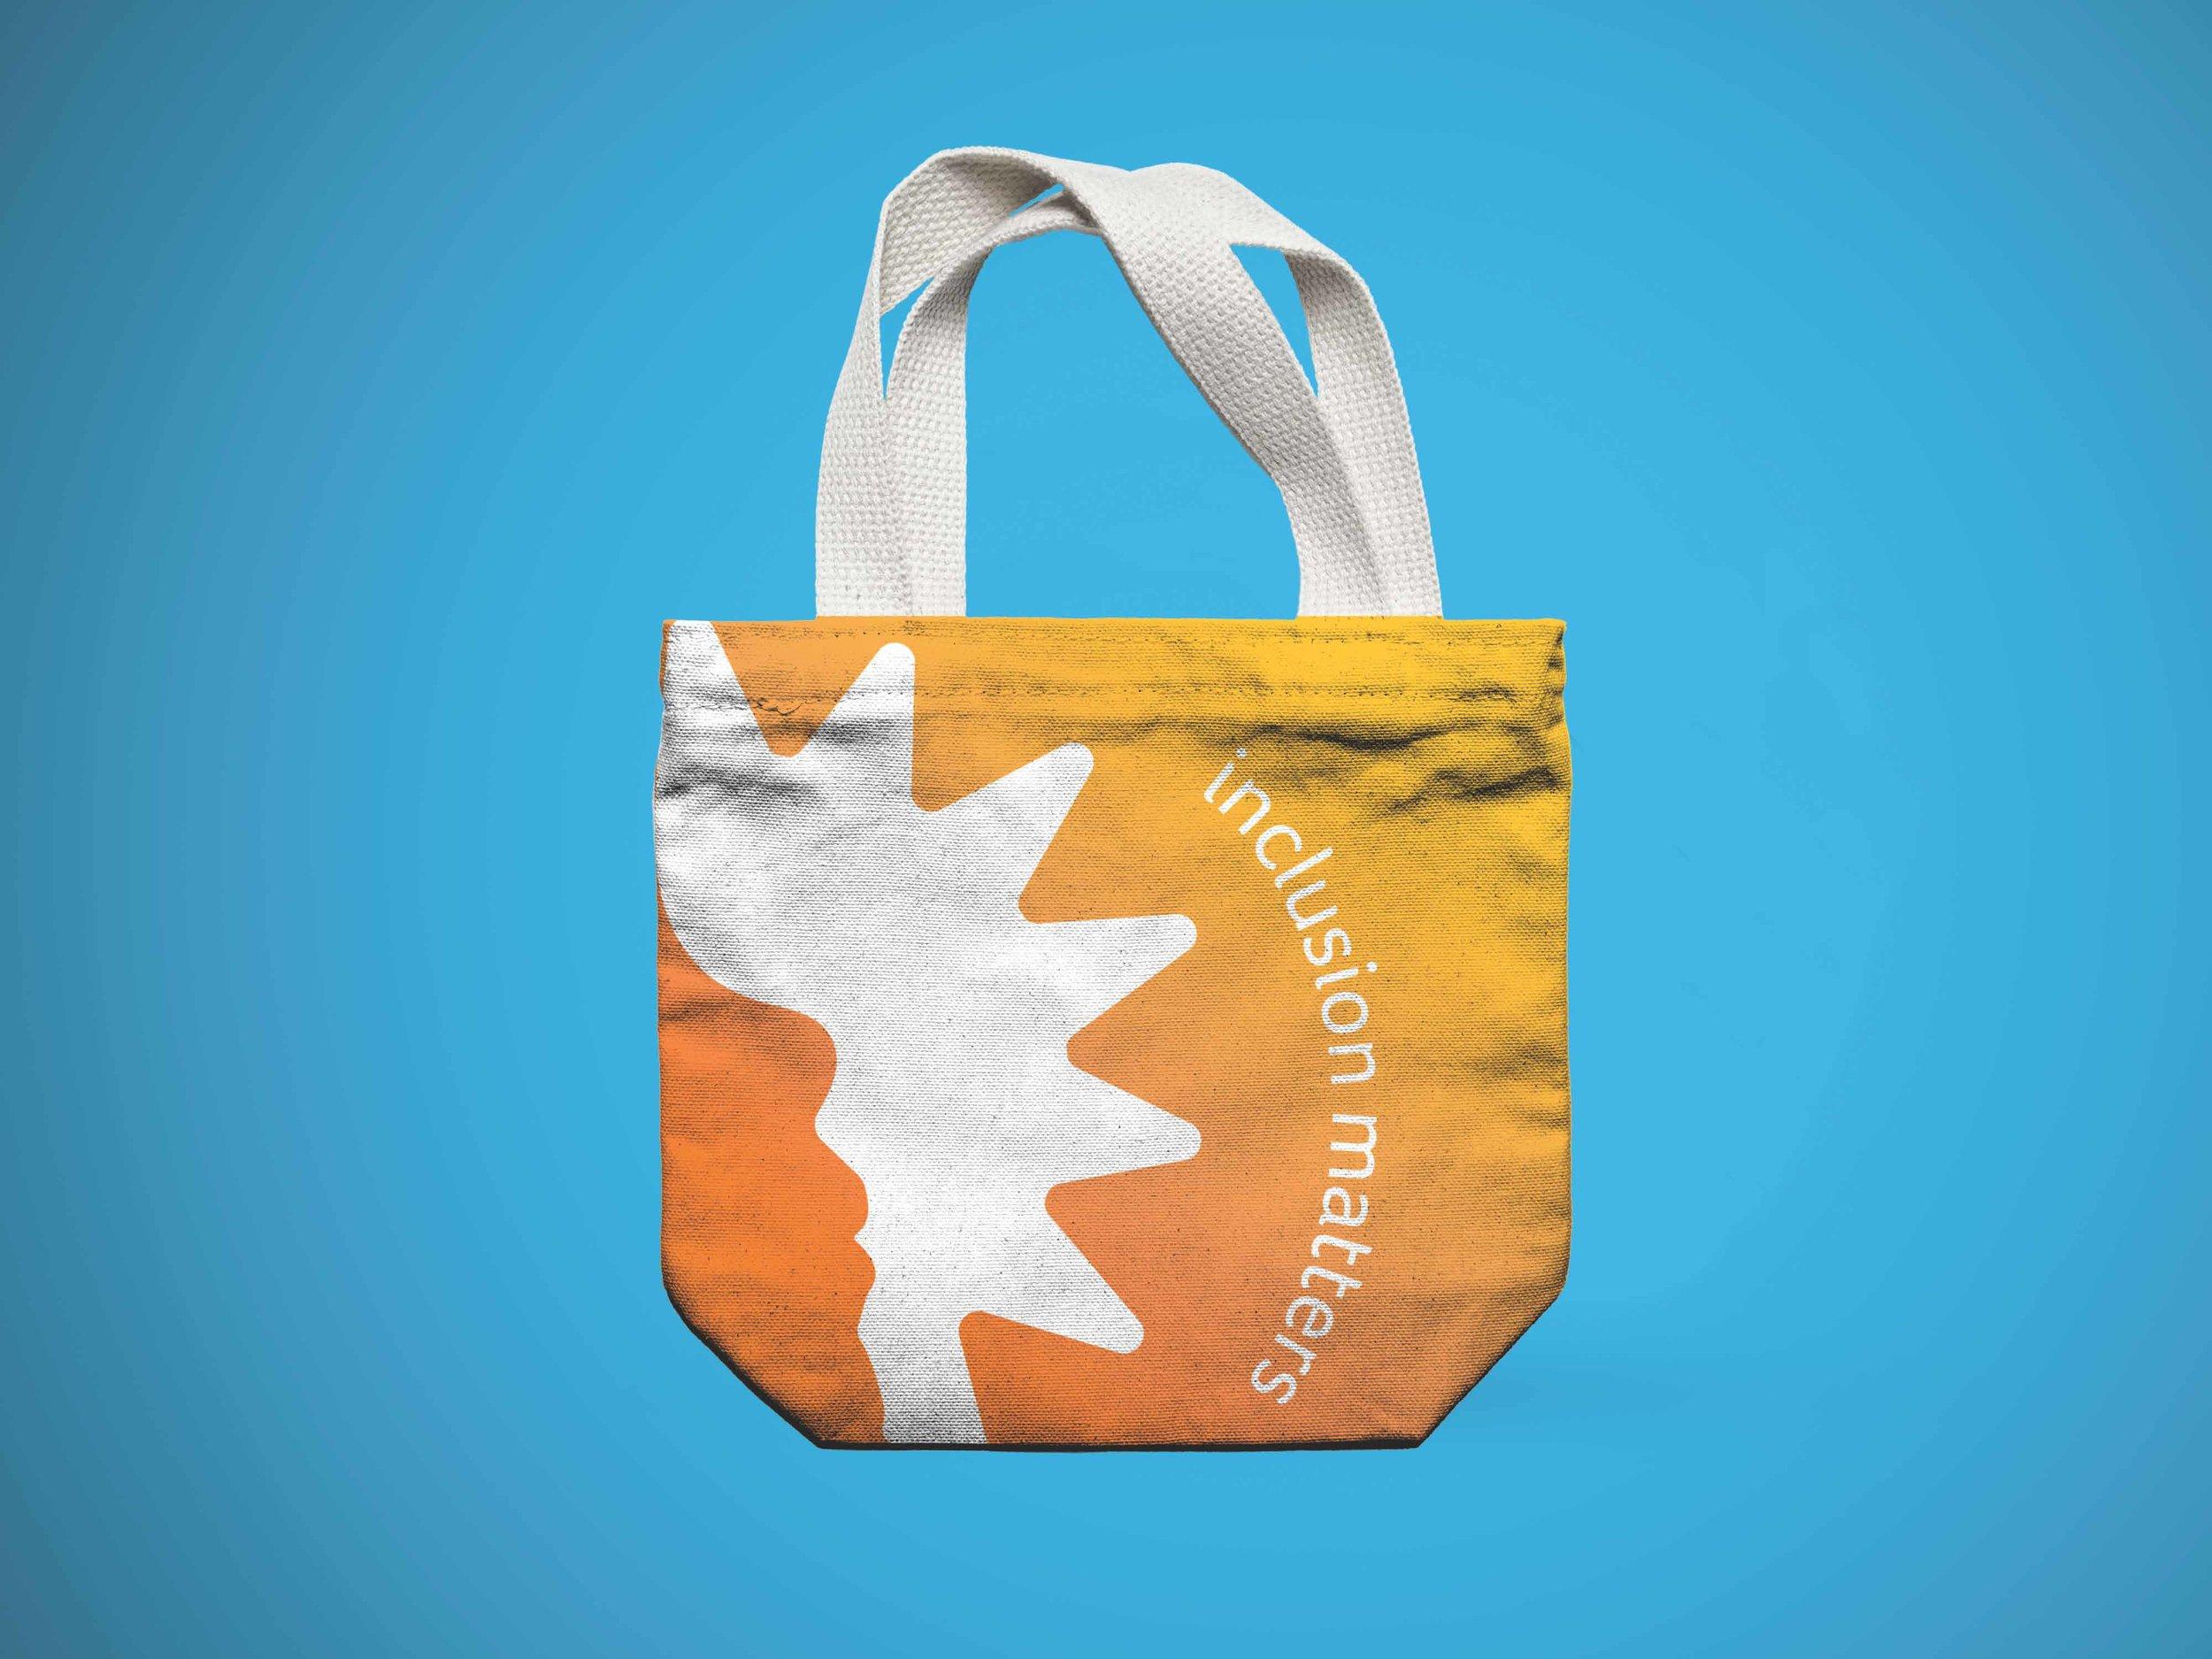 Shane's_Small Canvas Tote Bag MockUp.jpg